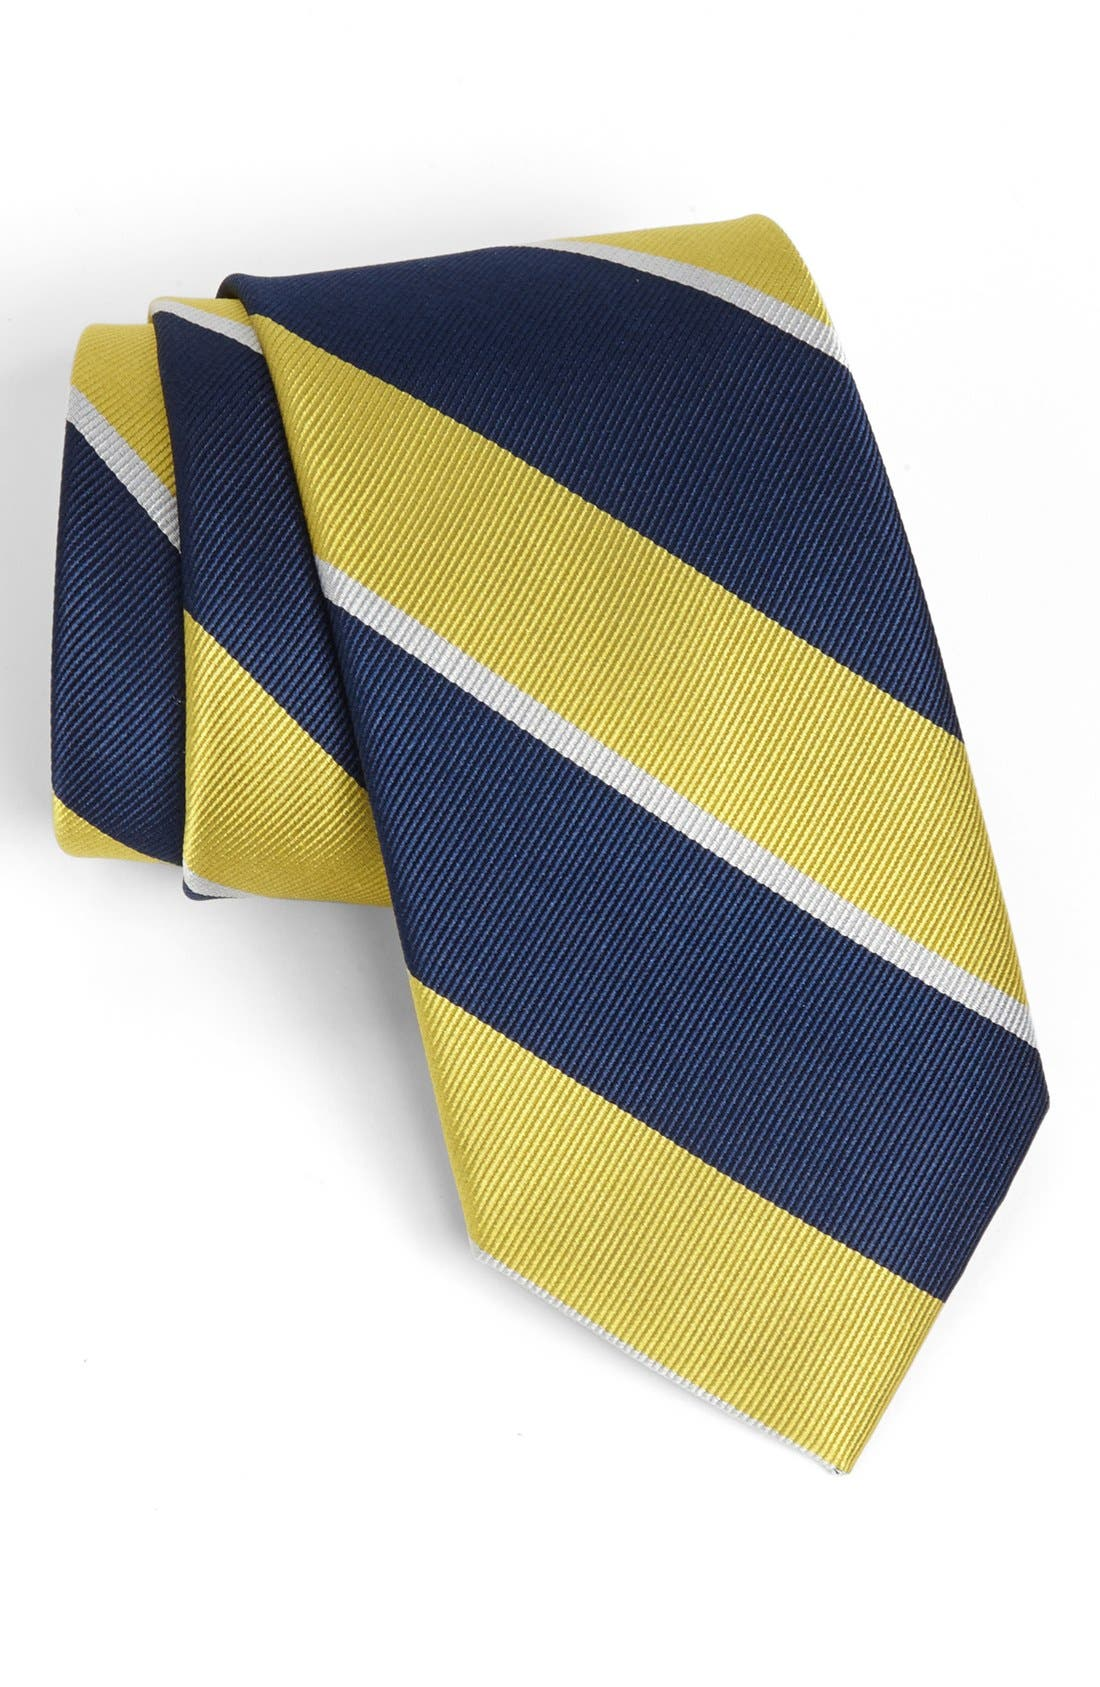 Main Image - 1901 'Overlook' Stripe Silk Tie